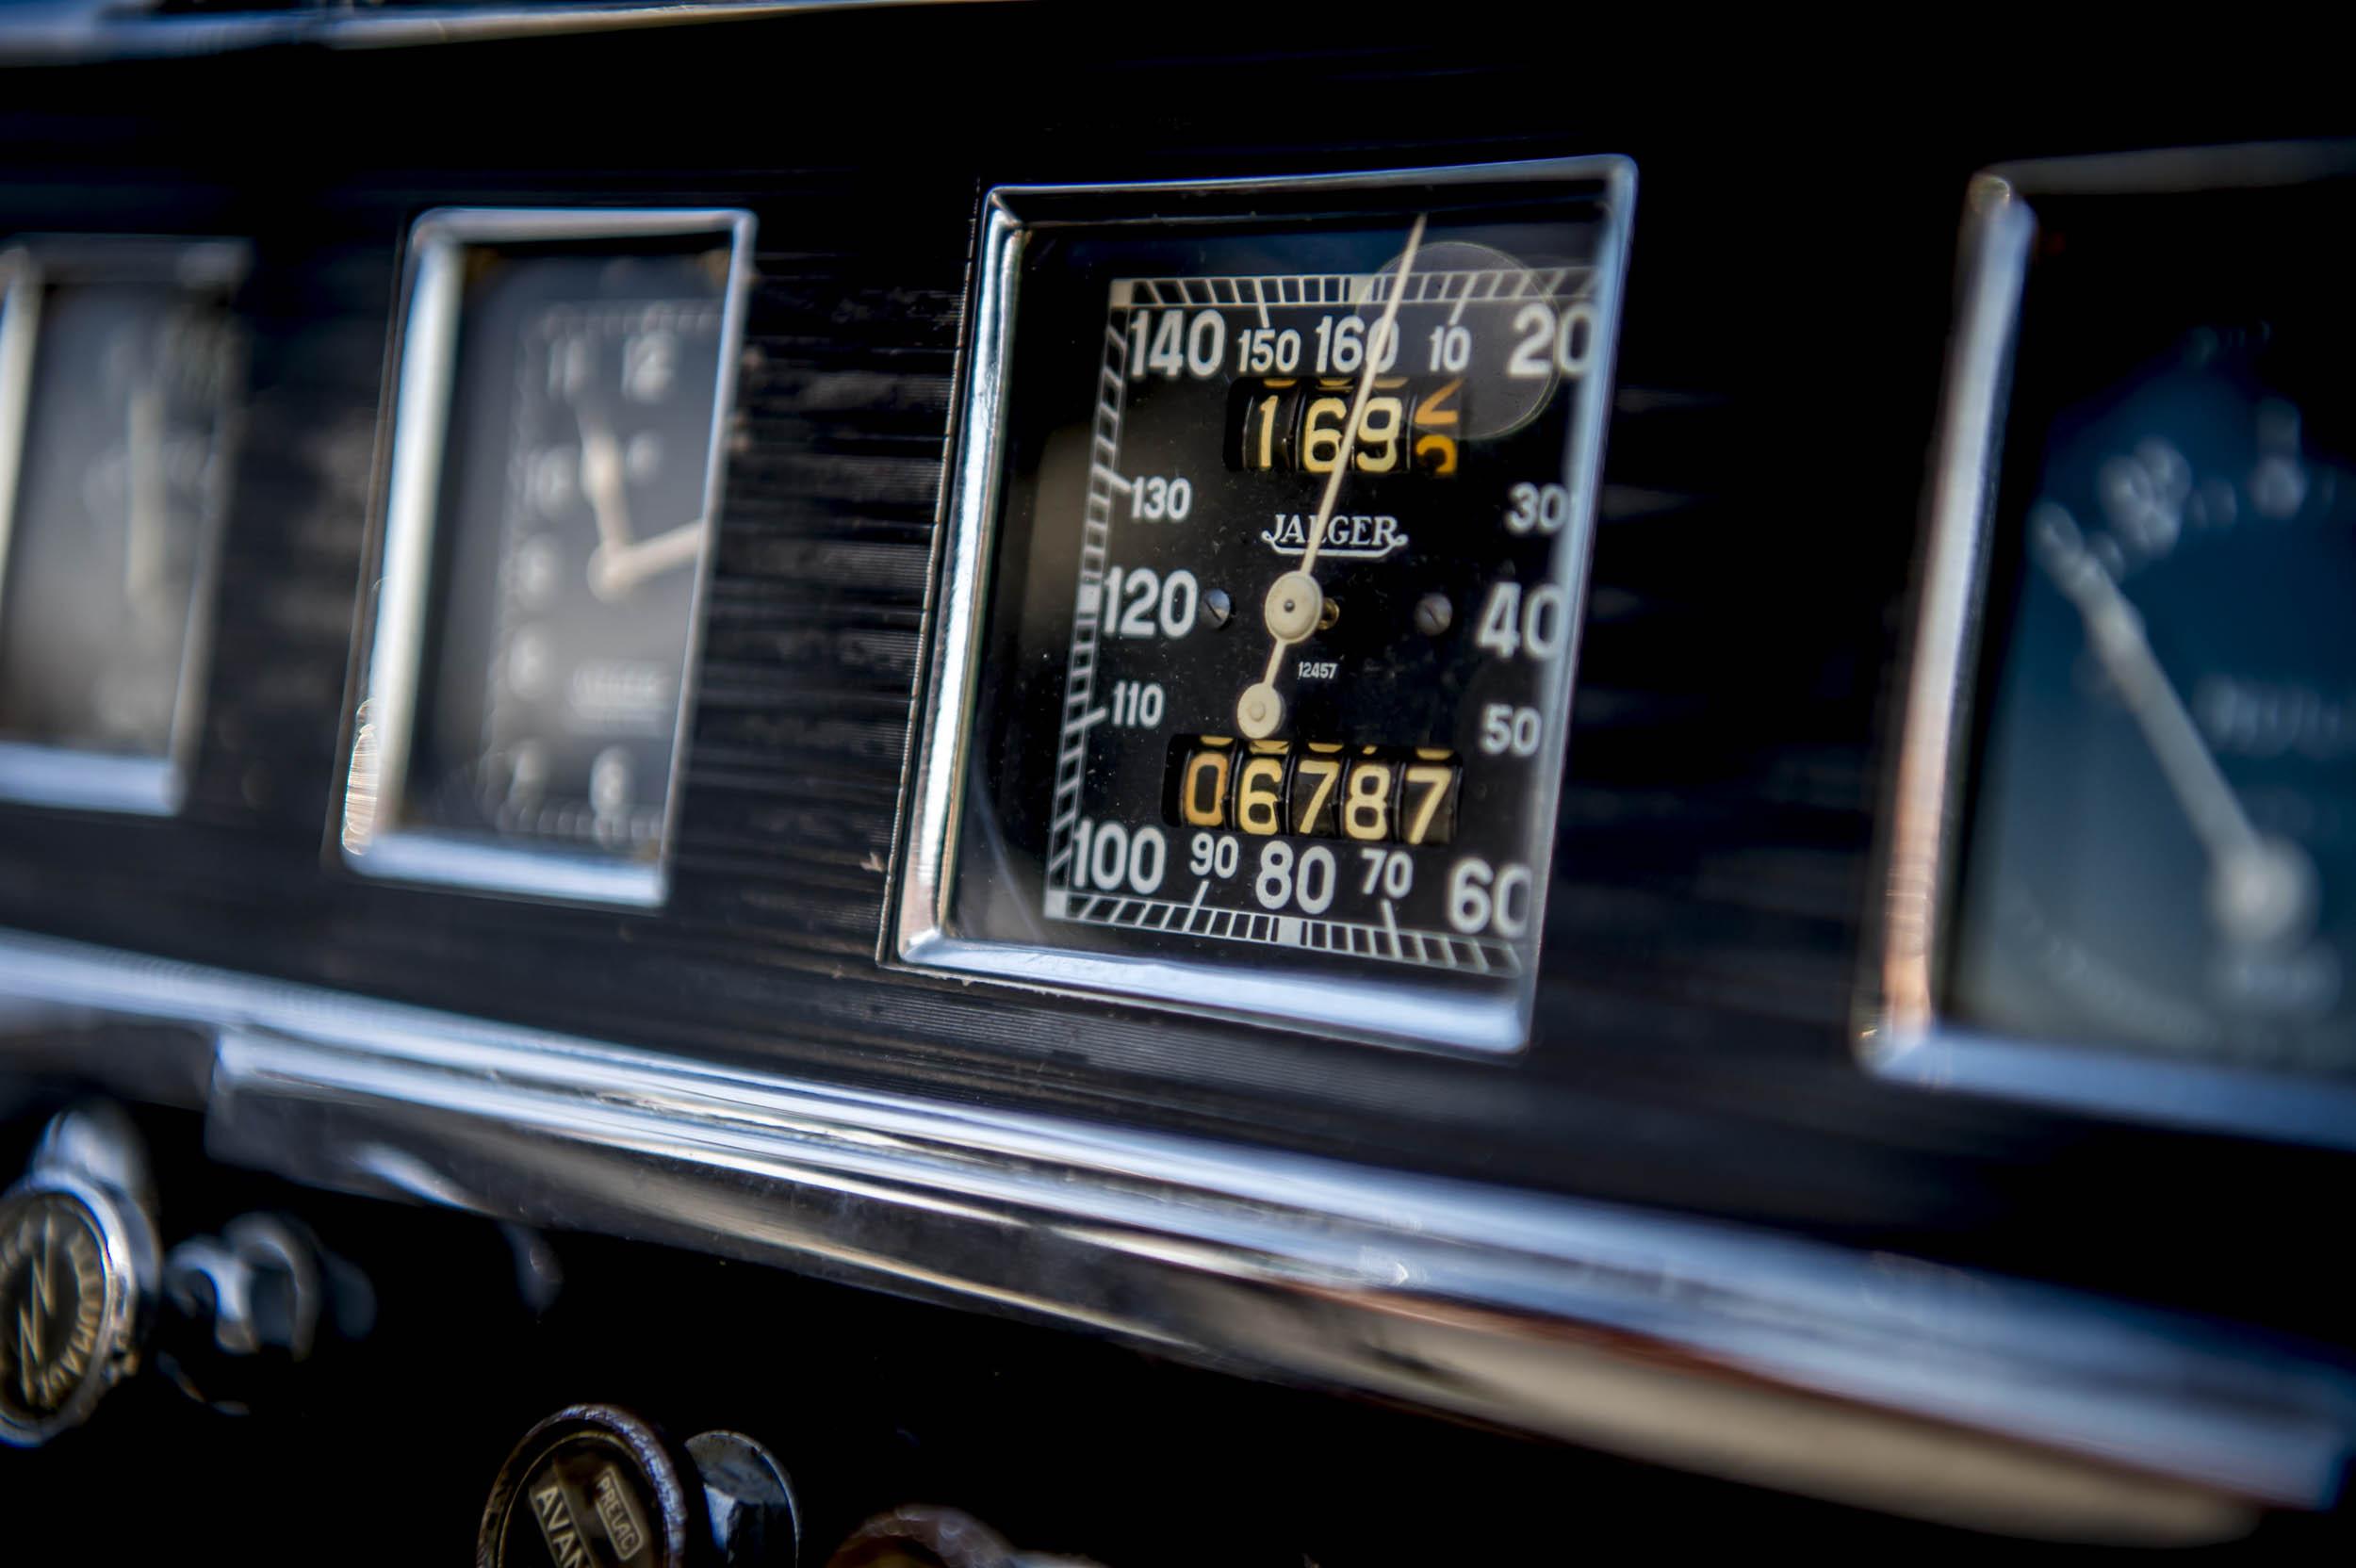 1929 renault nervastella coupe de ville dashboard